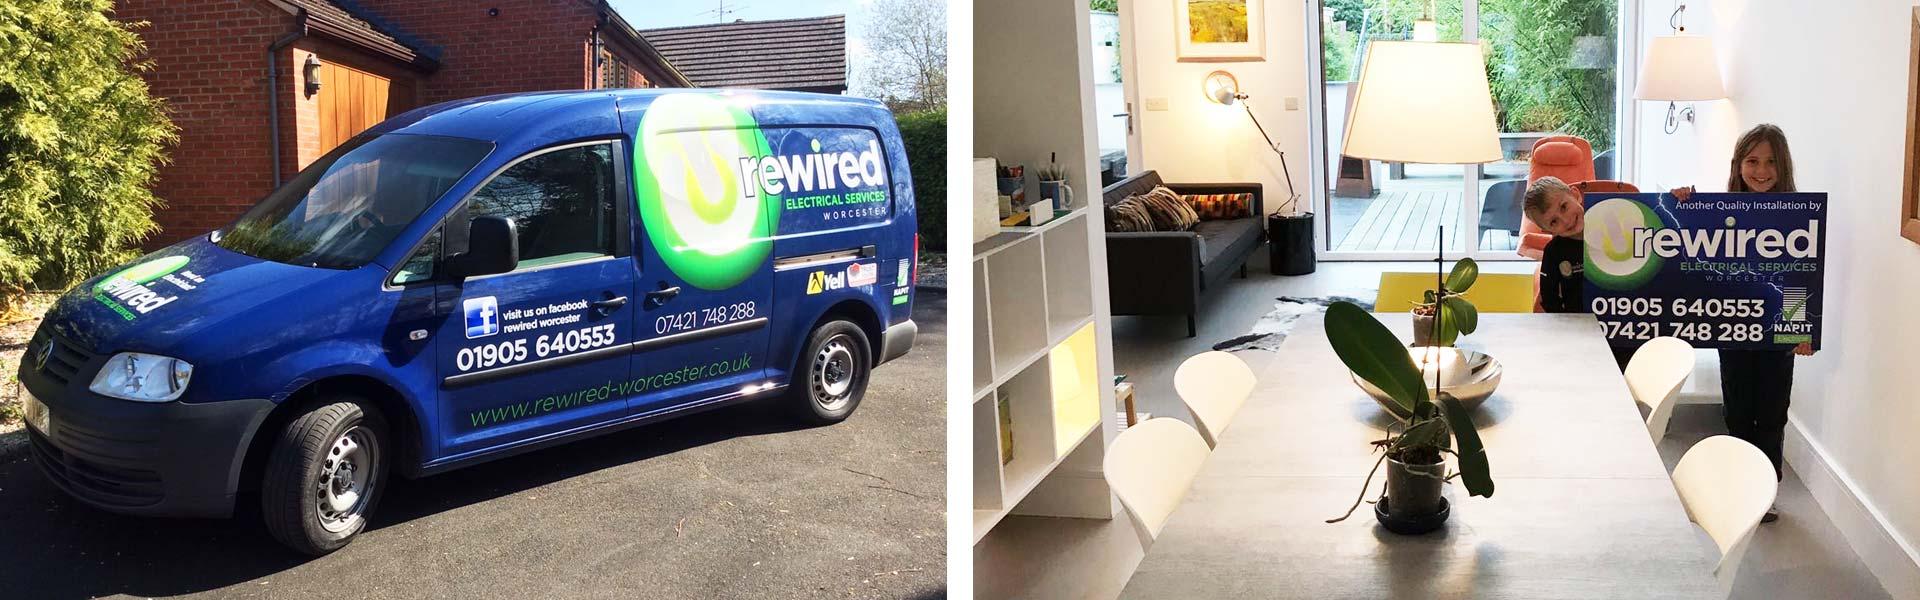 Rewired Worcester Van